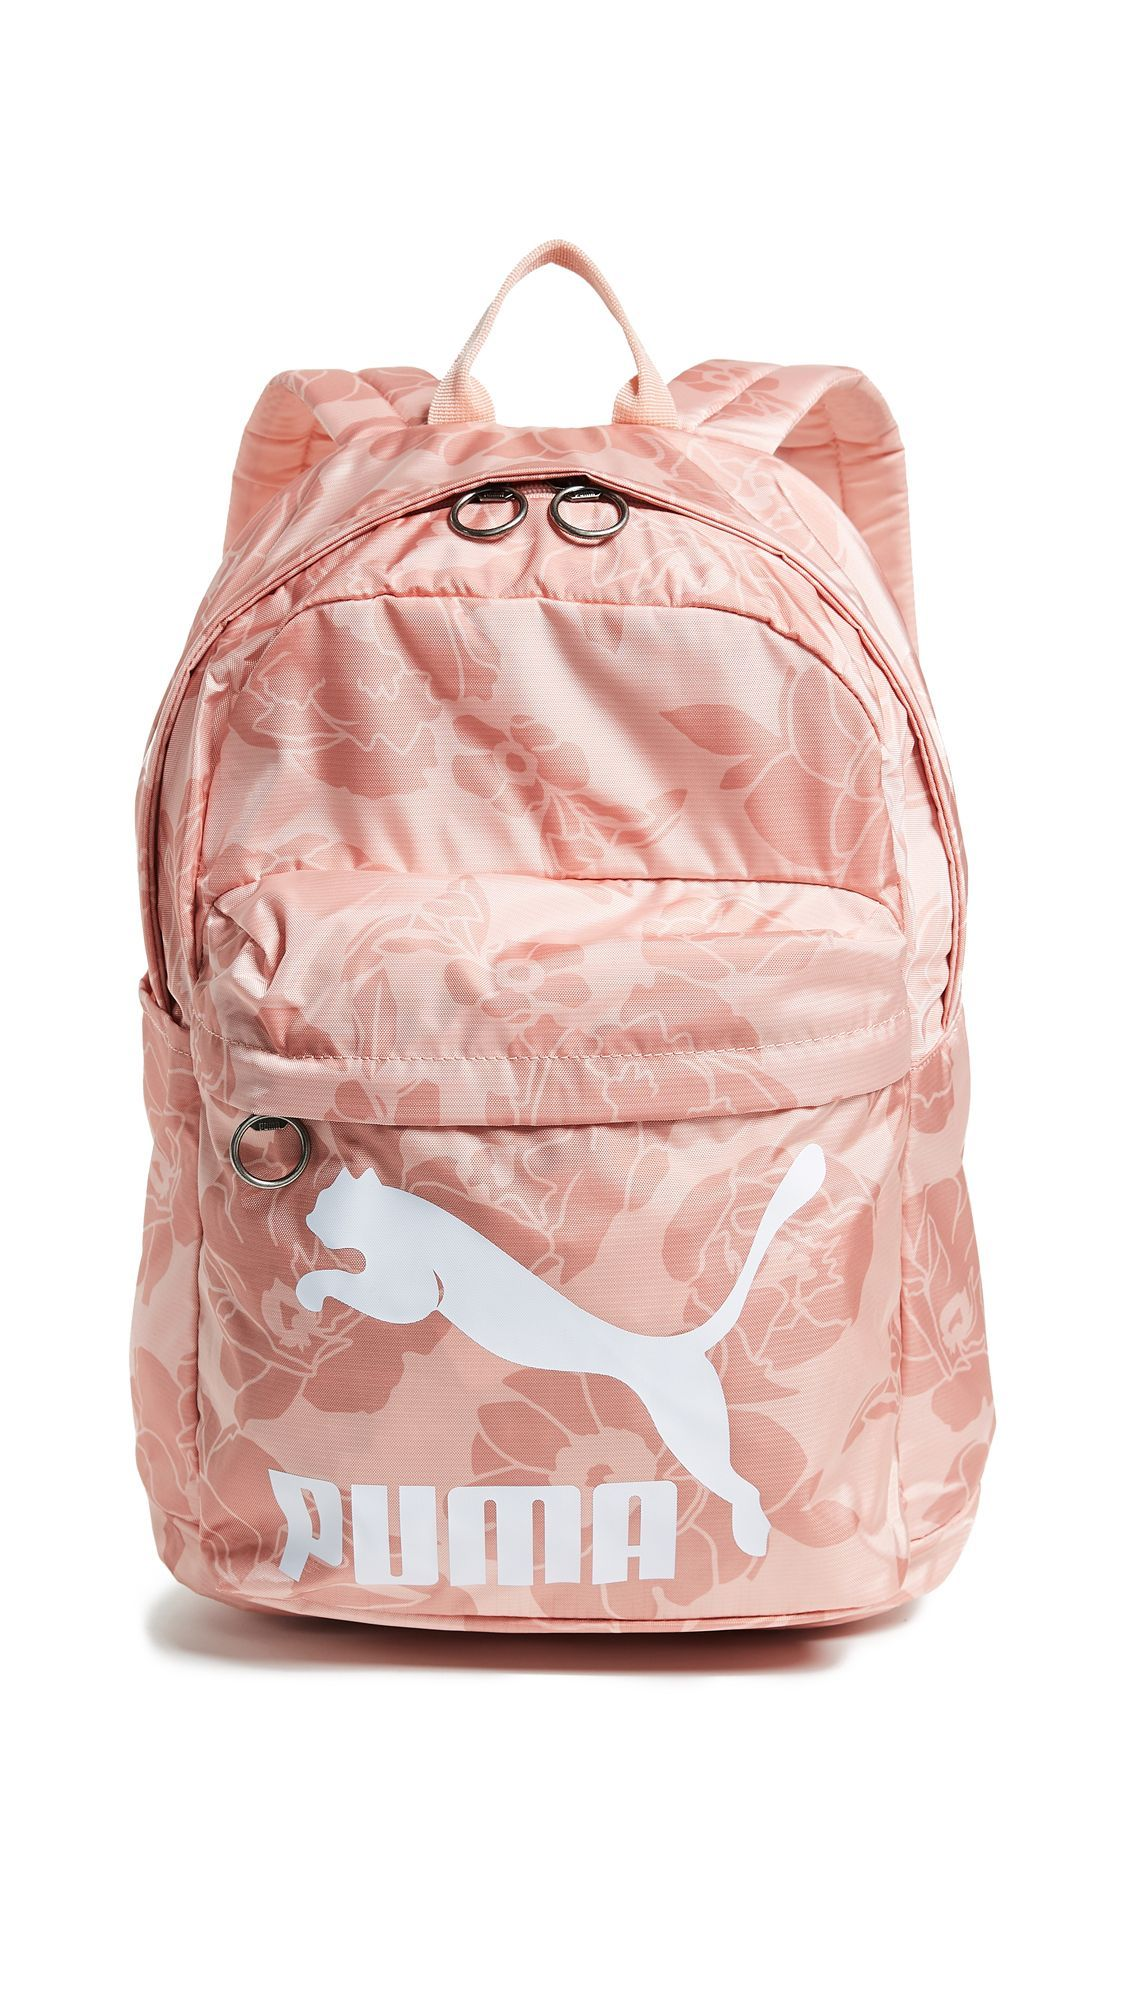 mochila puma mujer pequeña